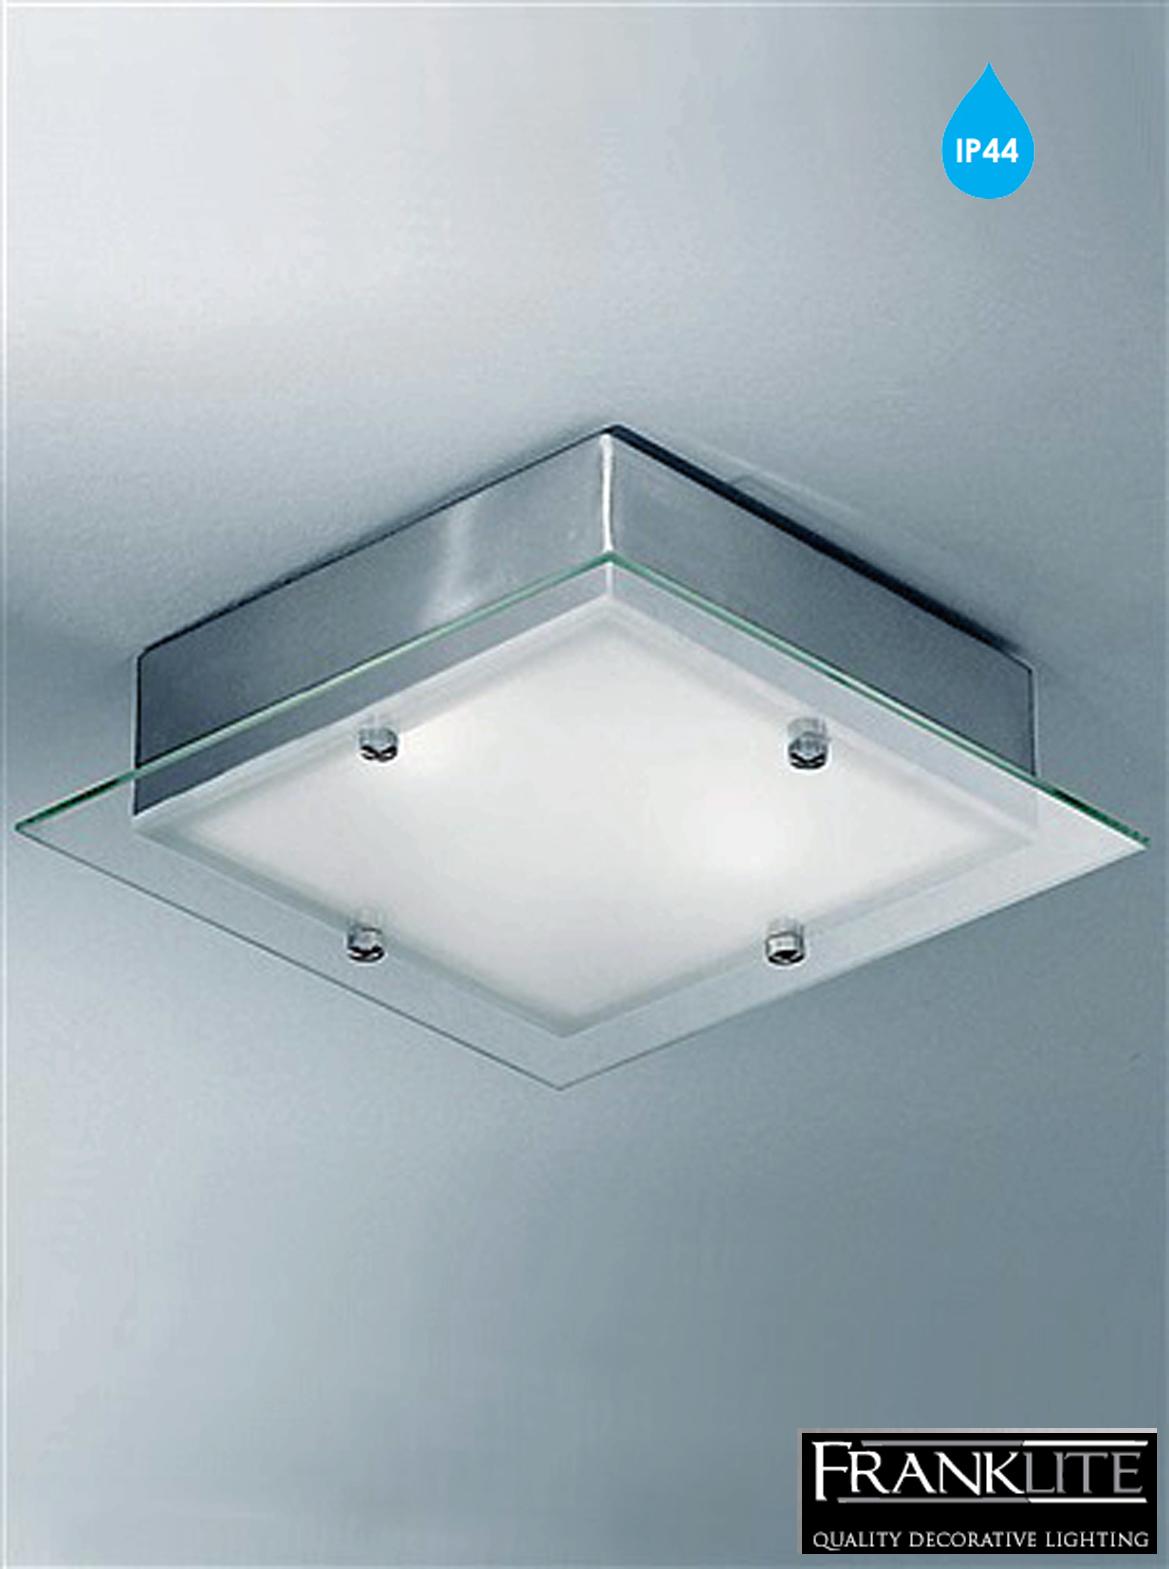 Franklite satin glass satin nickel square flush light bathroom ceiling fitting cf1250 from for Square bathroom ceiling light